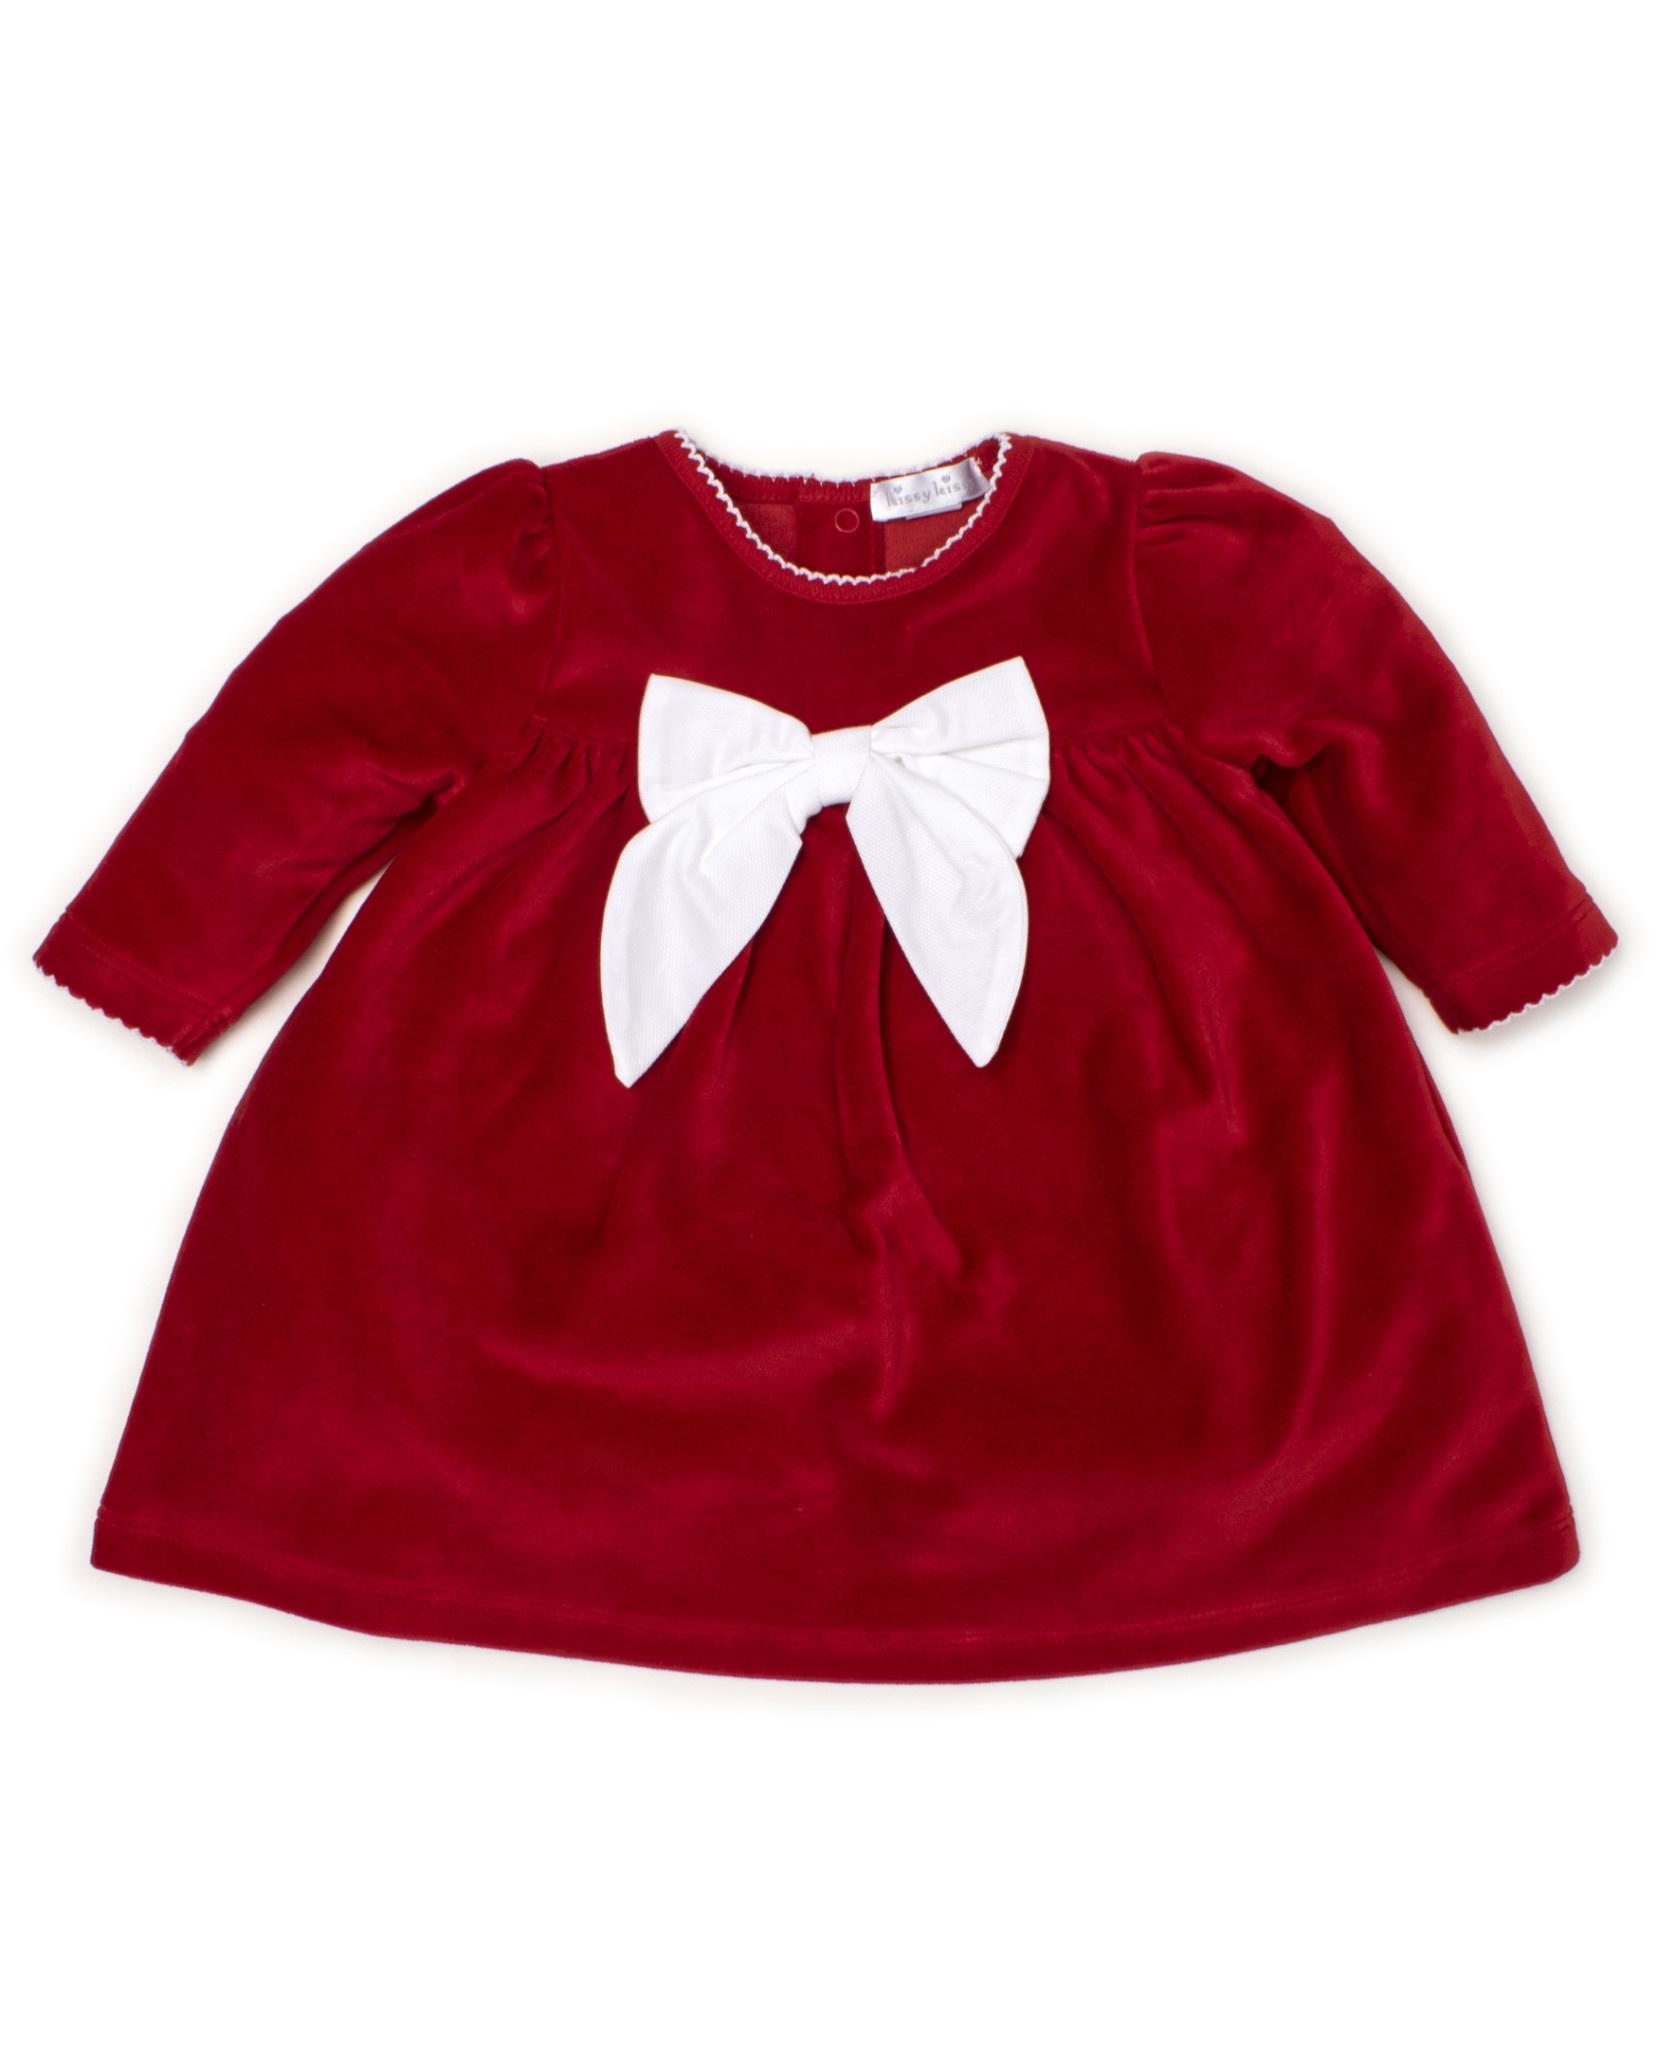 kissy kissy Kissy Kissy Santa Santics Velour Dress